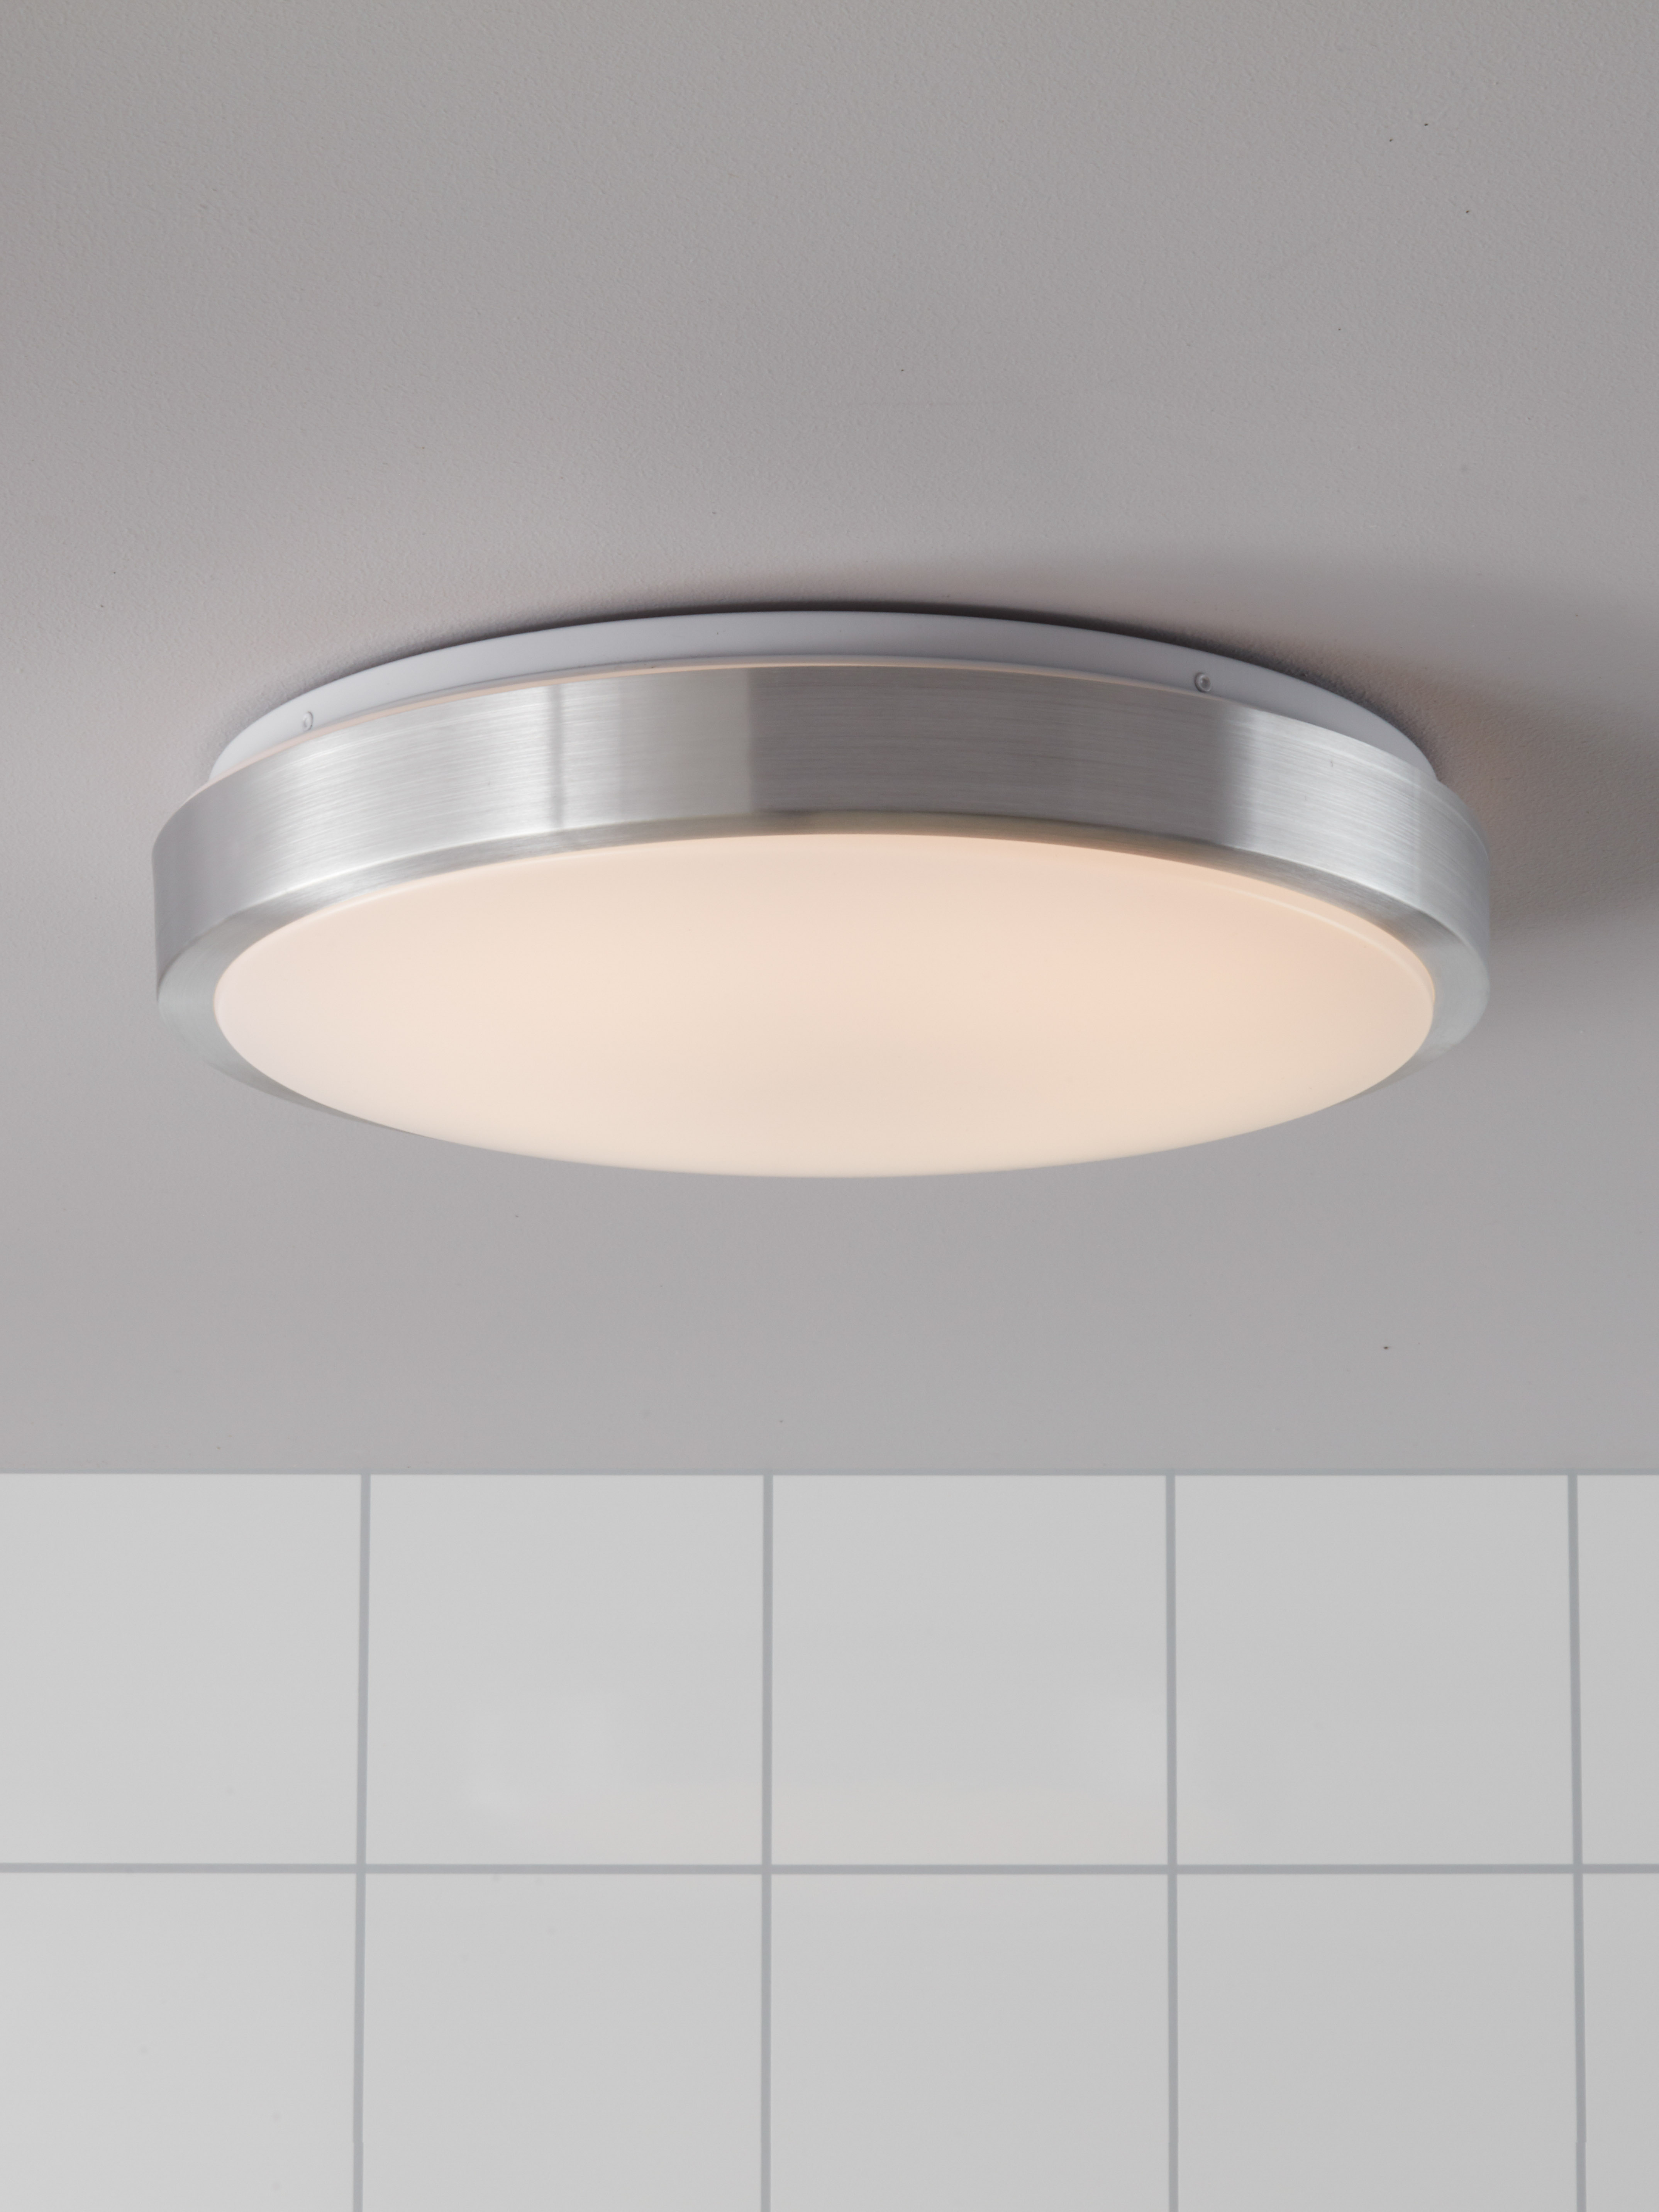 MOON - Plafond Bathroom 39